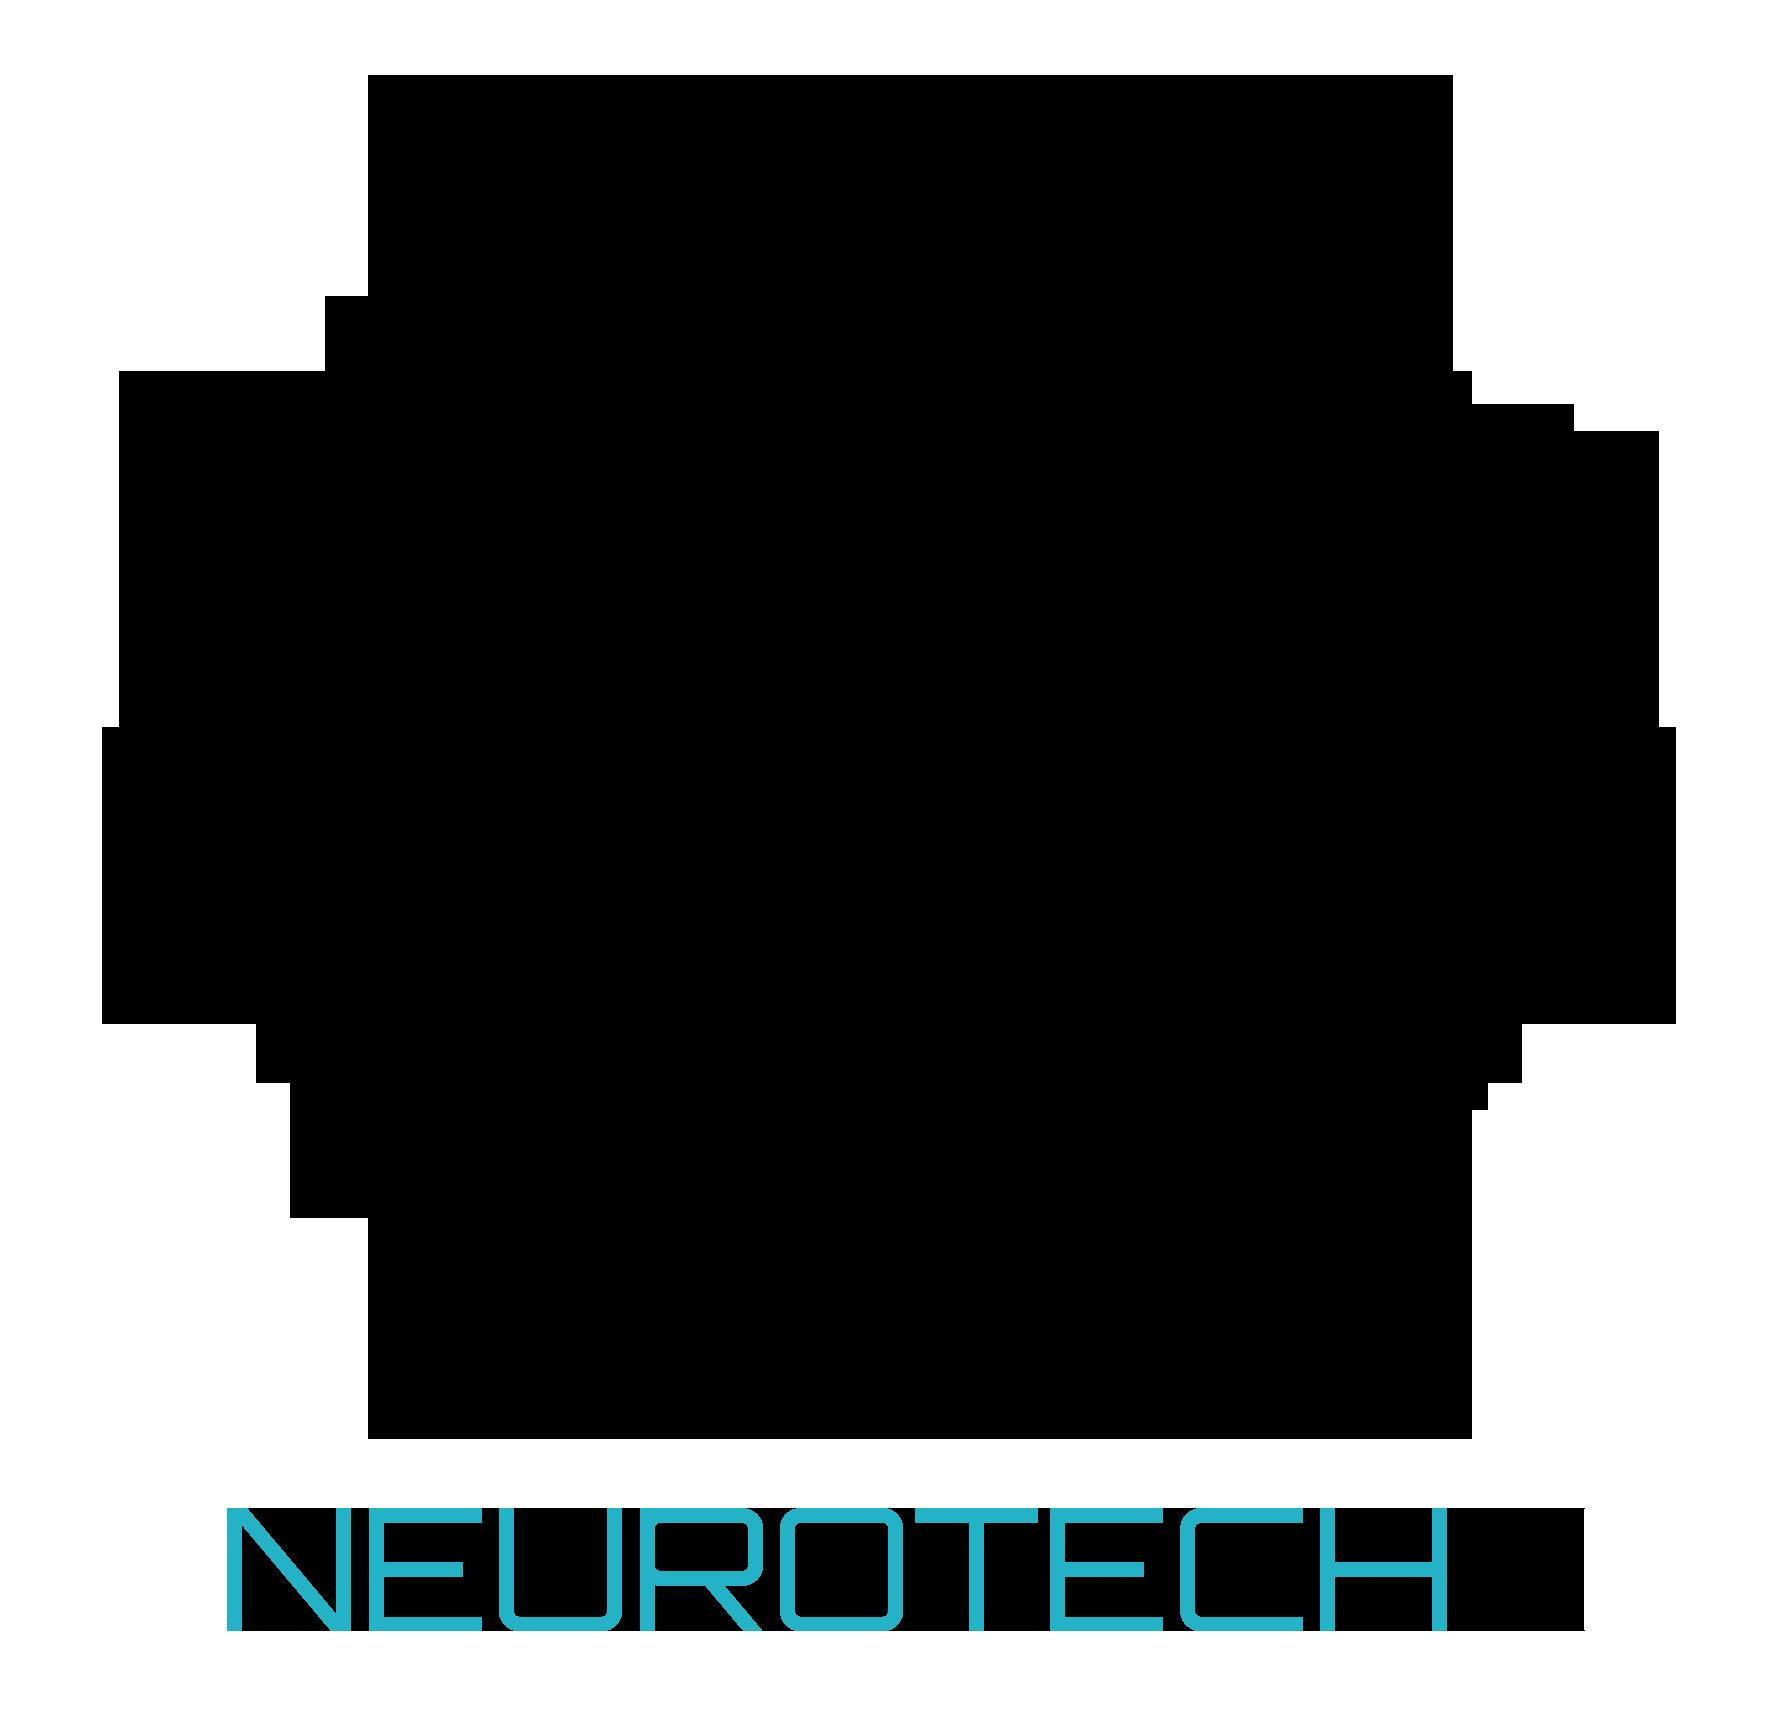 NeuroTechX_Logo2.png